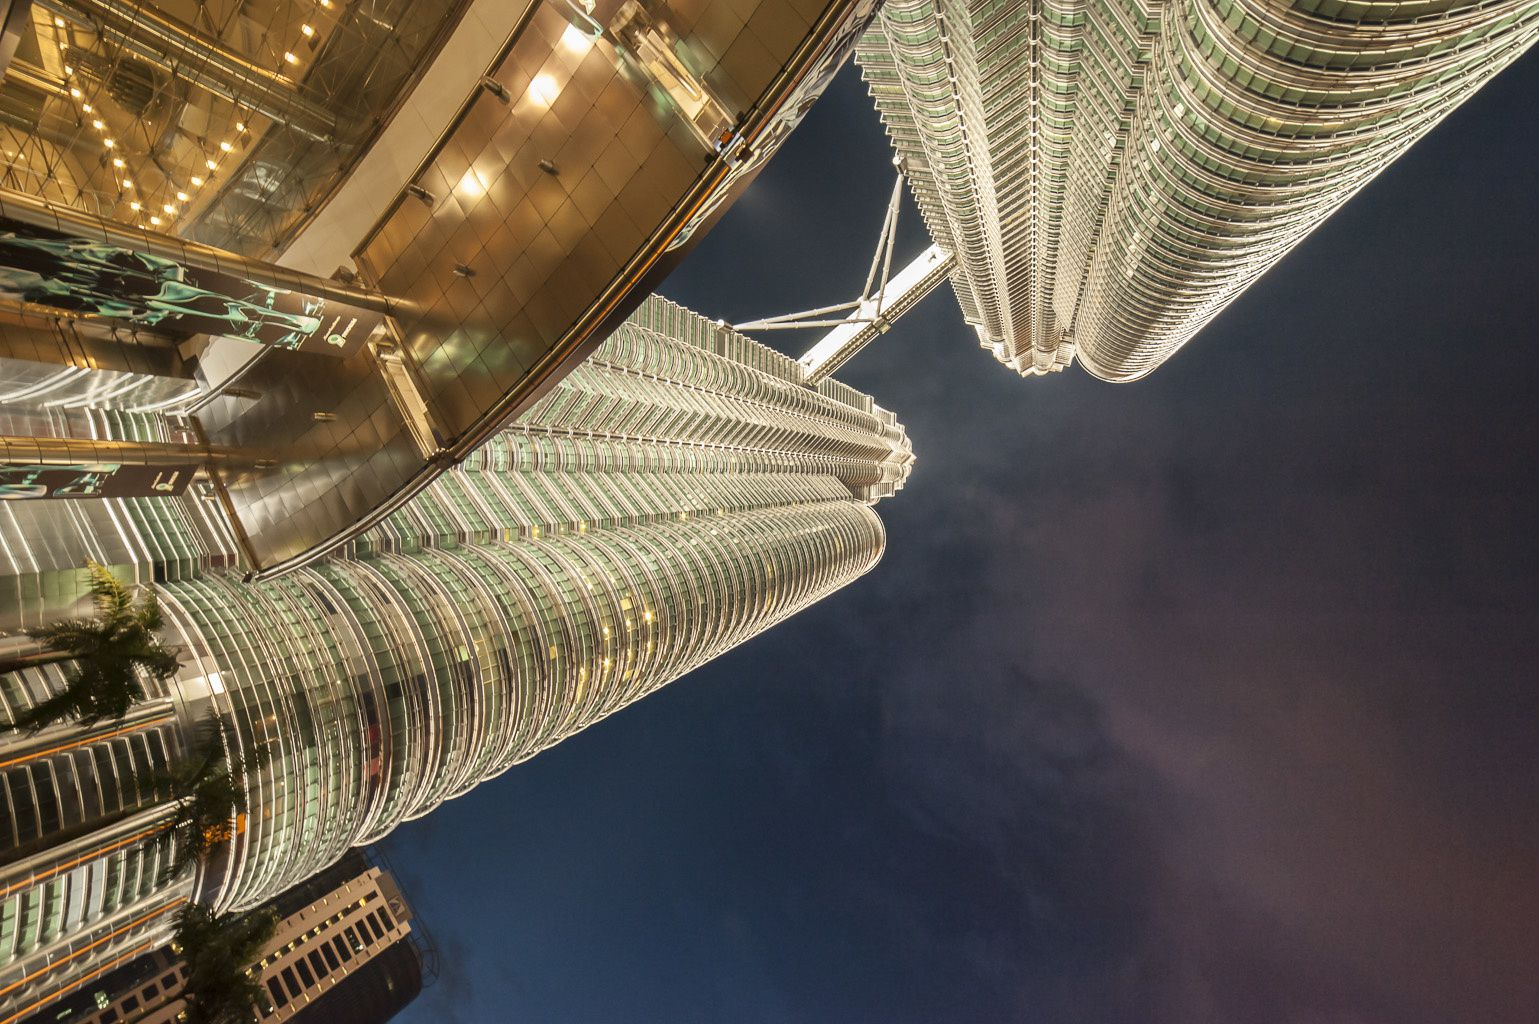 Malaisie - Kuala Lumpur - Doctes Petronas